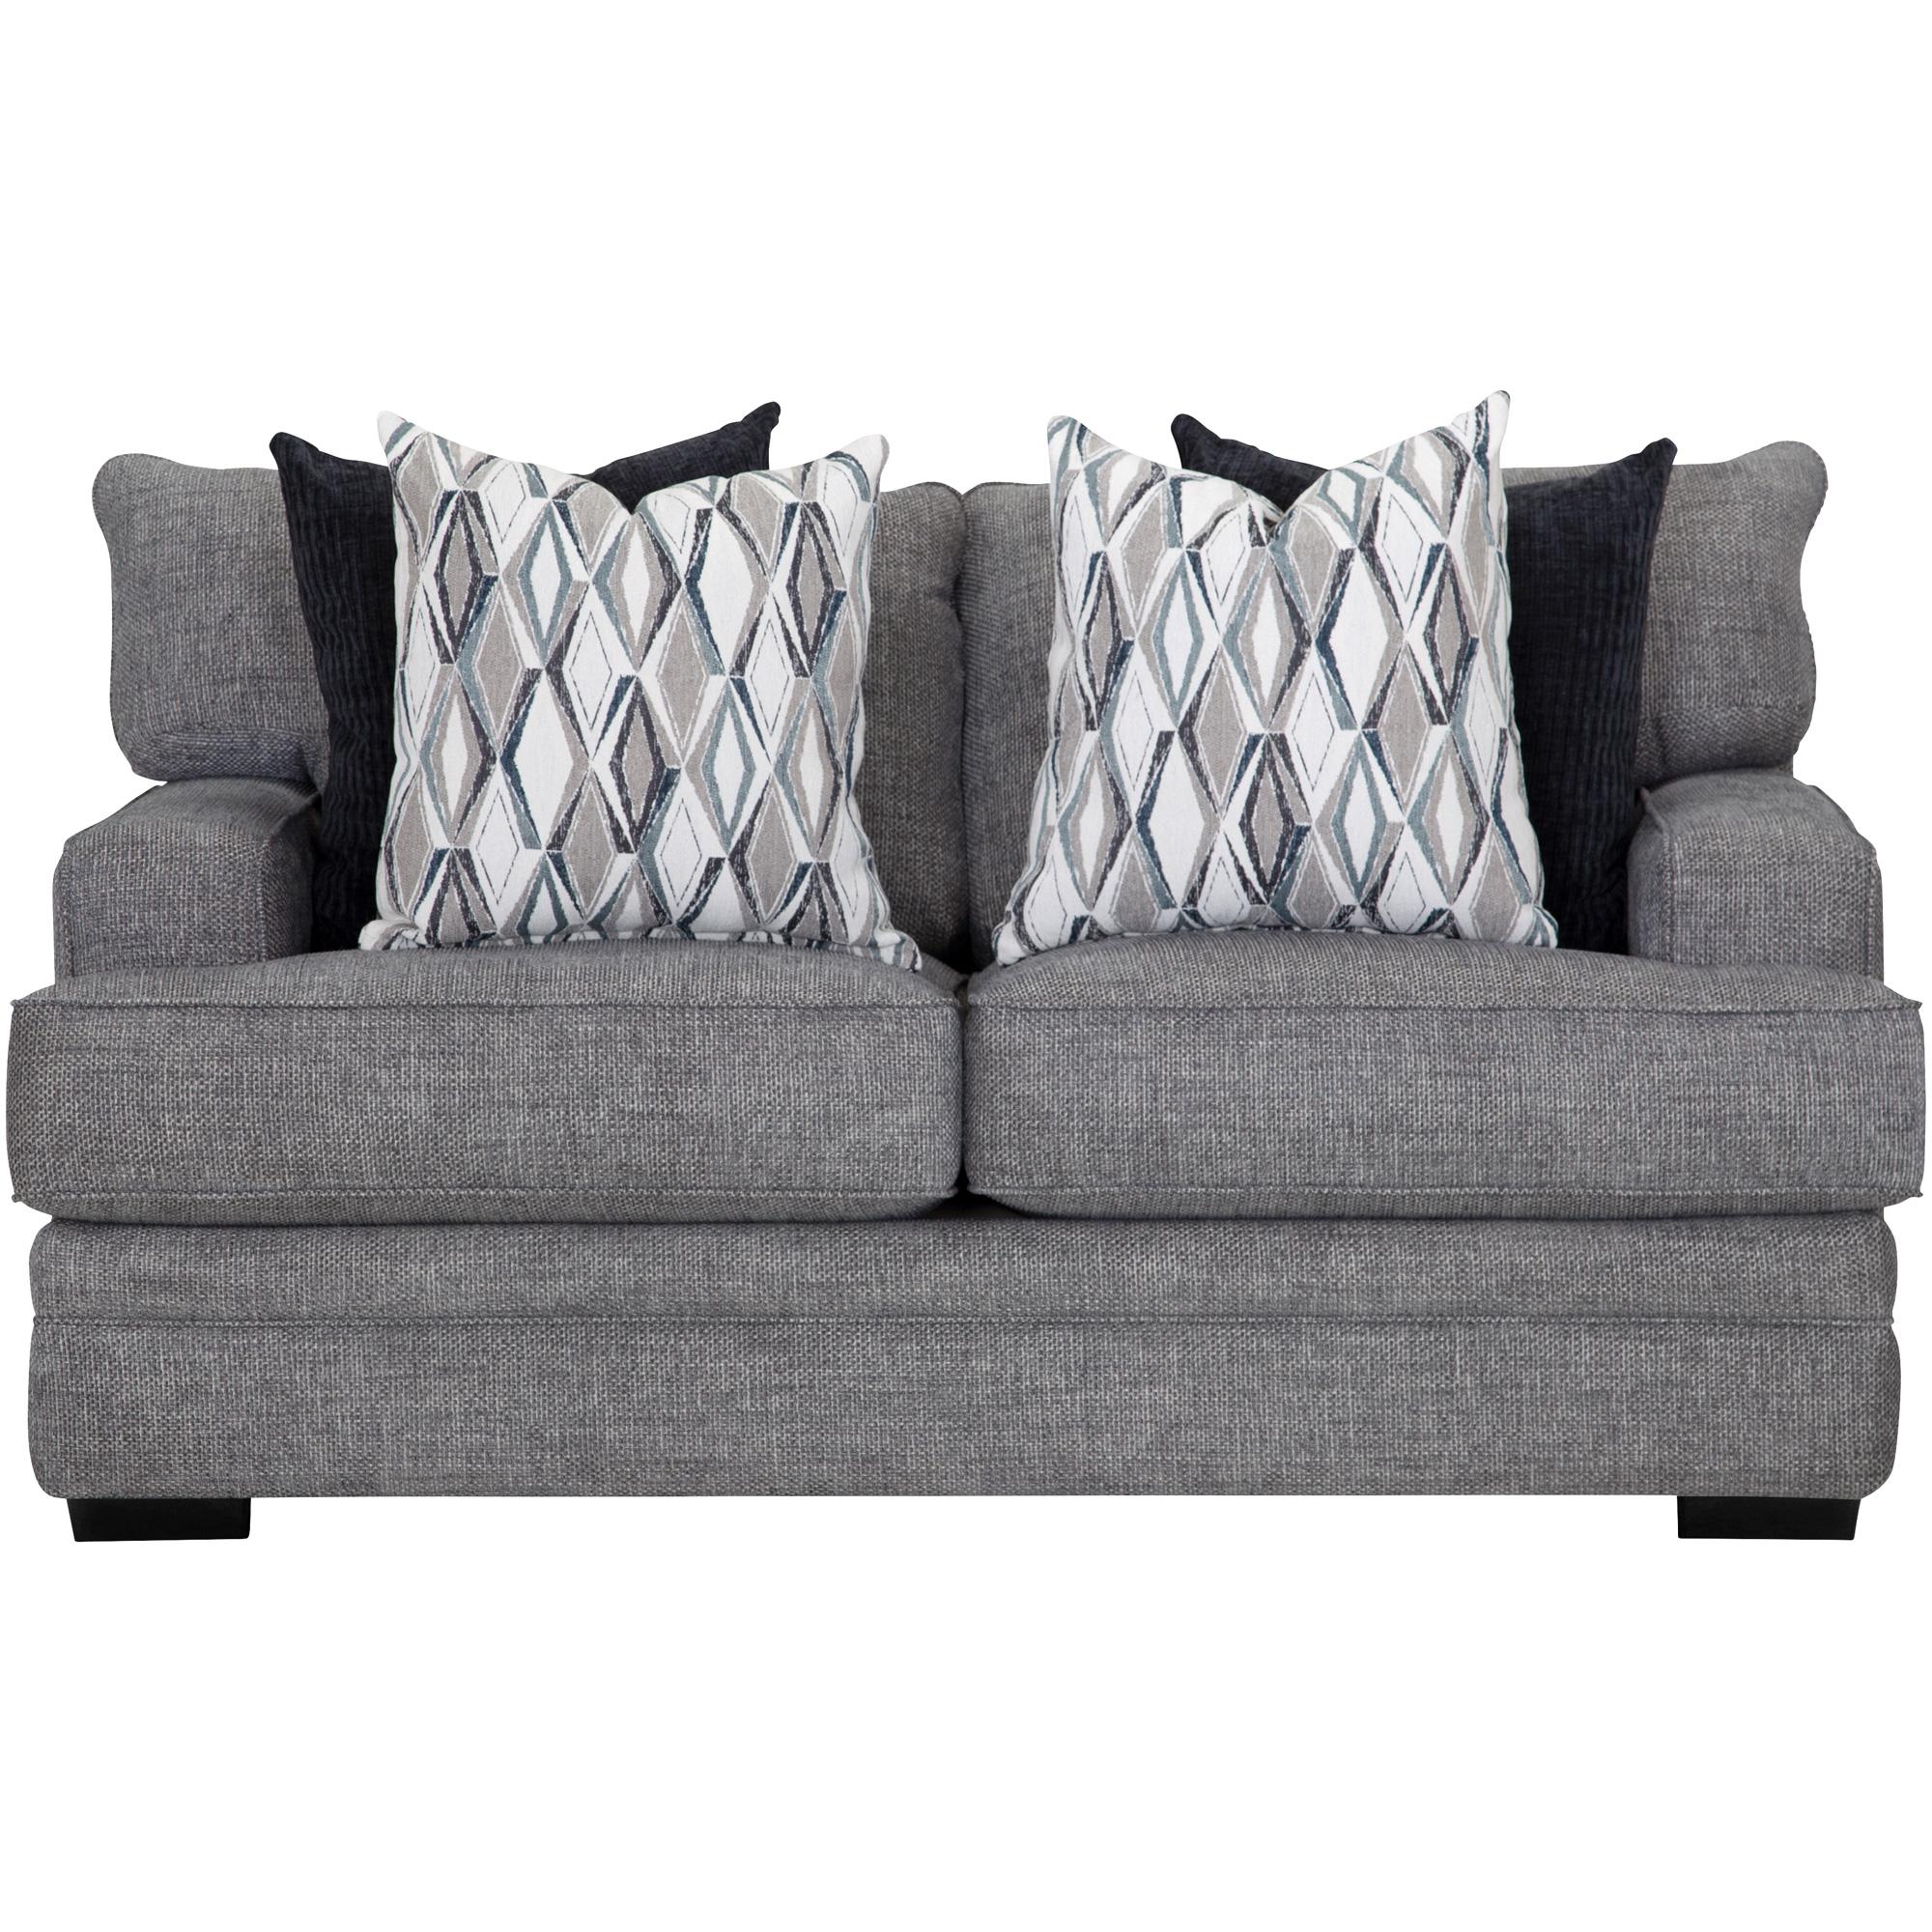 Franklin | Crowes Denim Loveseat Sofa